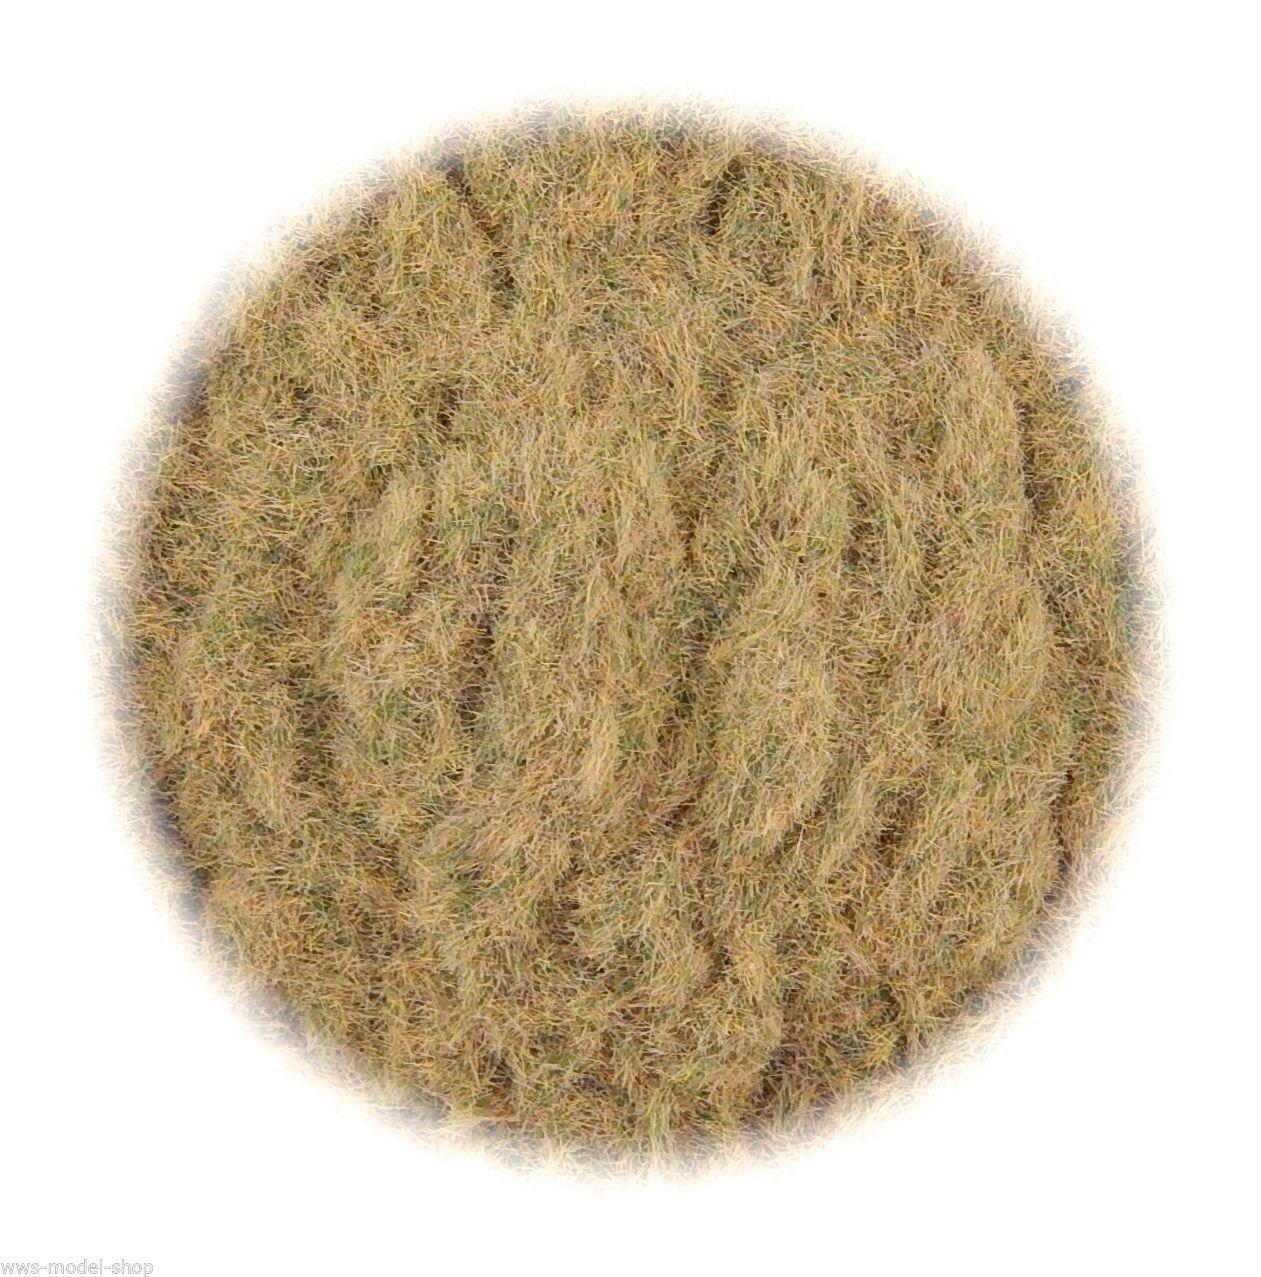 WWS Farm Field B 2mm Mix 10g Model Wargames Basing Model Static Grass 10g G,O,HO/OO,TT,N.Z Wargames B01LYT4AYL, 八女茶の製造直売 お茶の浅野園:51f01528 --- ijpba.info